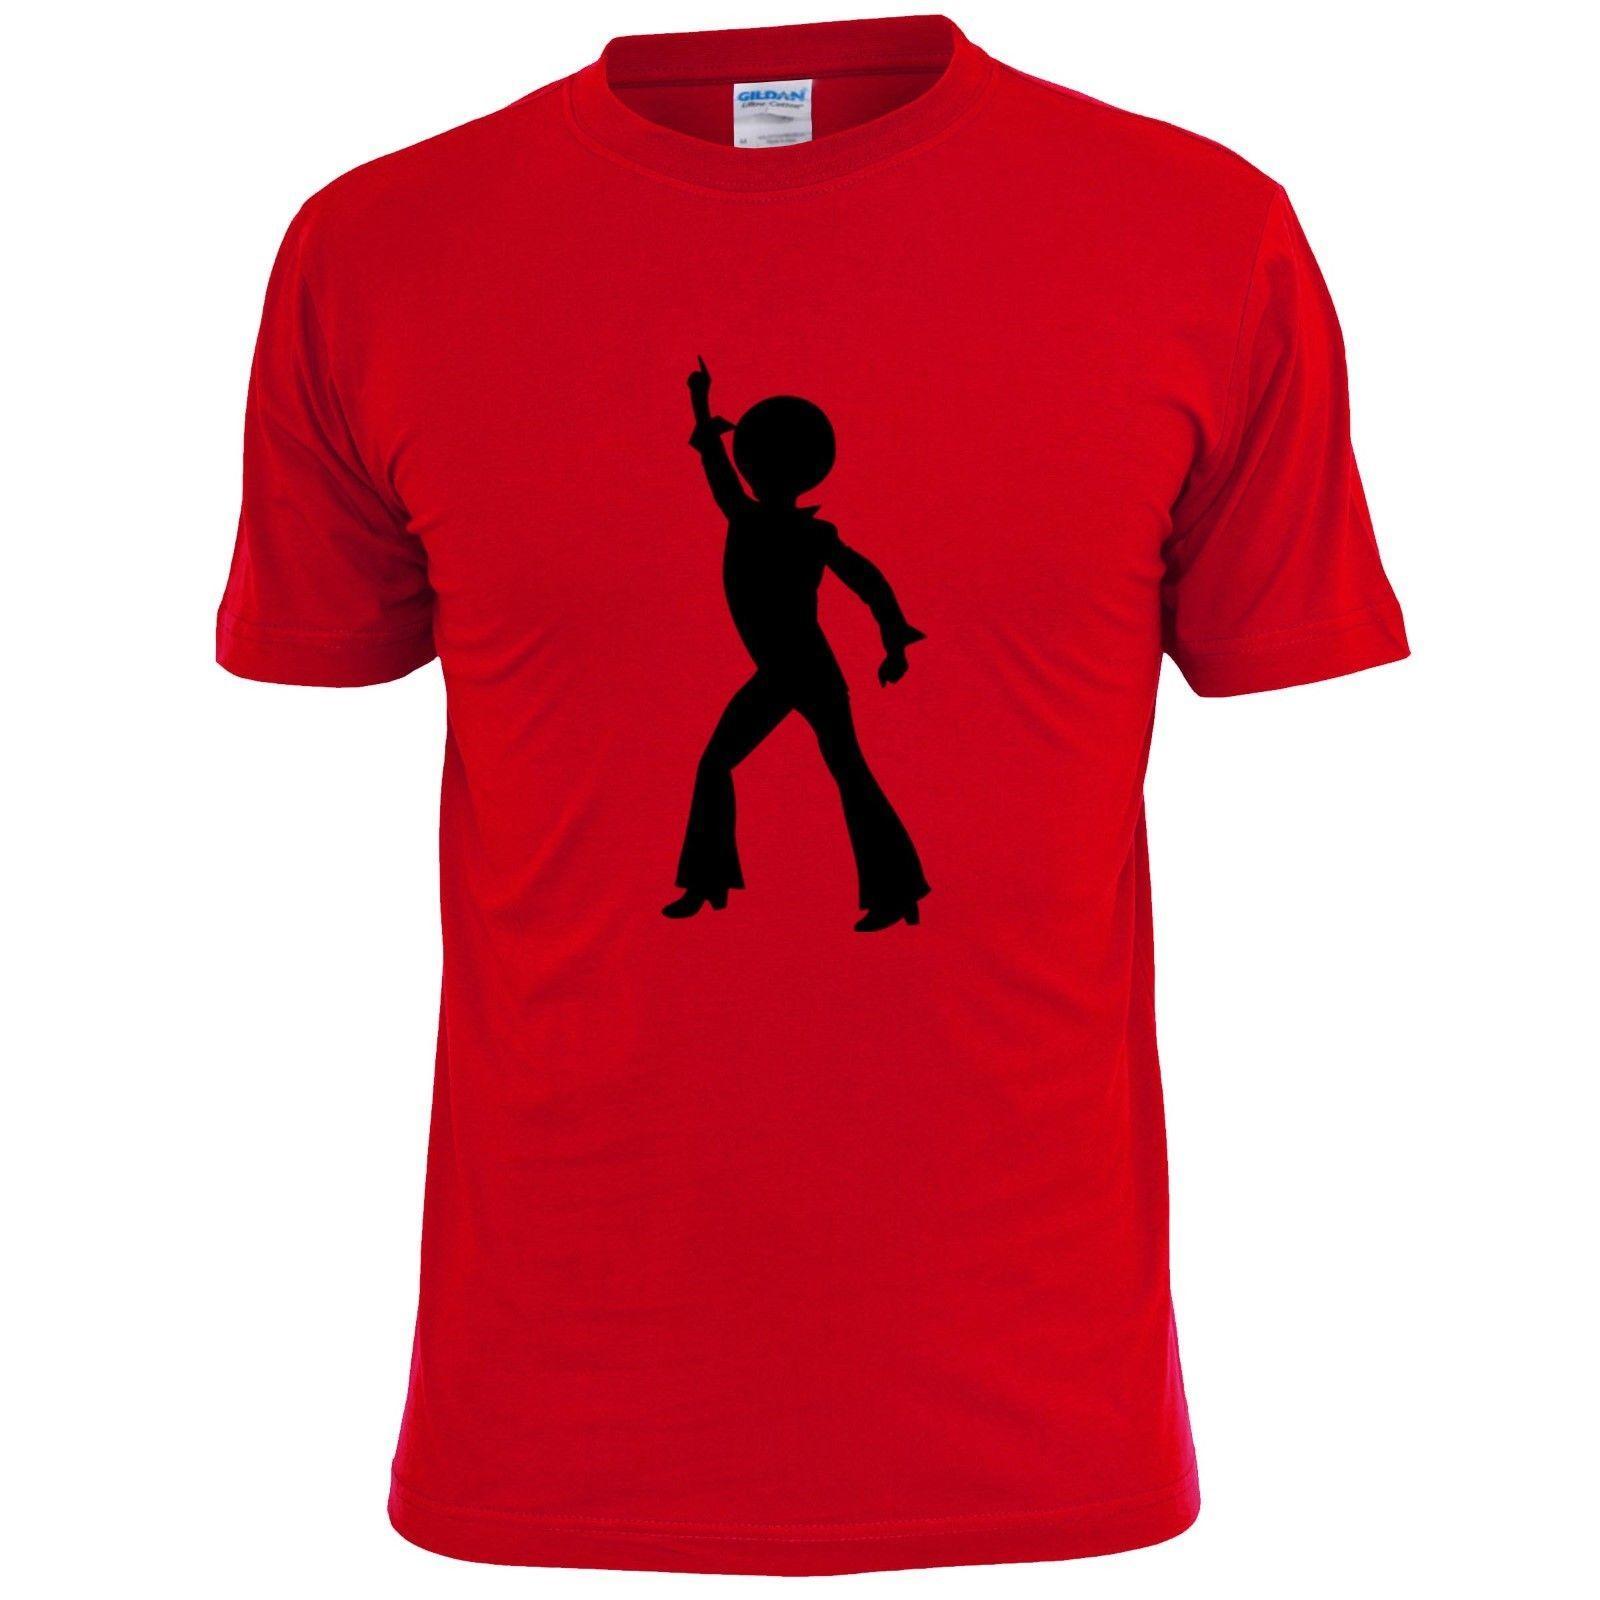 5471e2960 DISCO DANCER SILHOUETTE MENS T SHIRT MUSIC DANCING 70'S RETRO Casual Funny  Unisex Tee Gift 24 Hour Tee Shirts T Shirts T Shirts From Stop_to_shop, ...